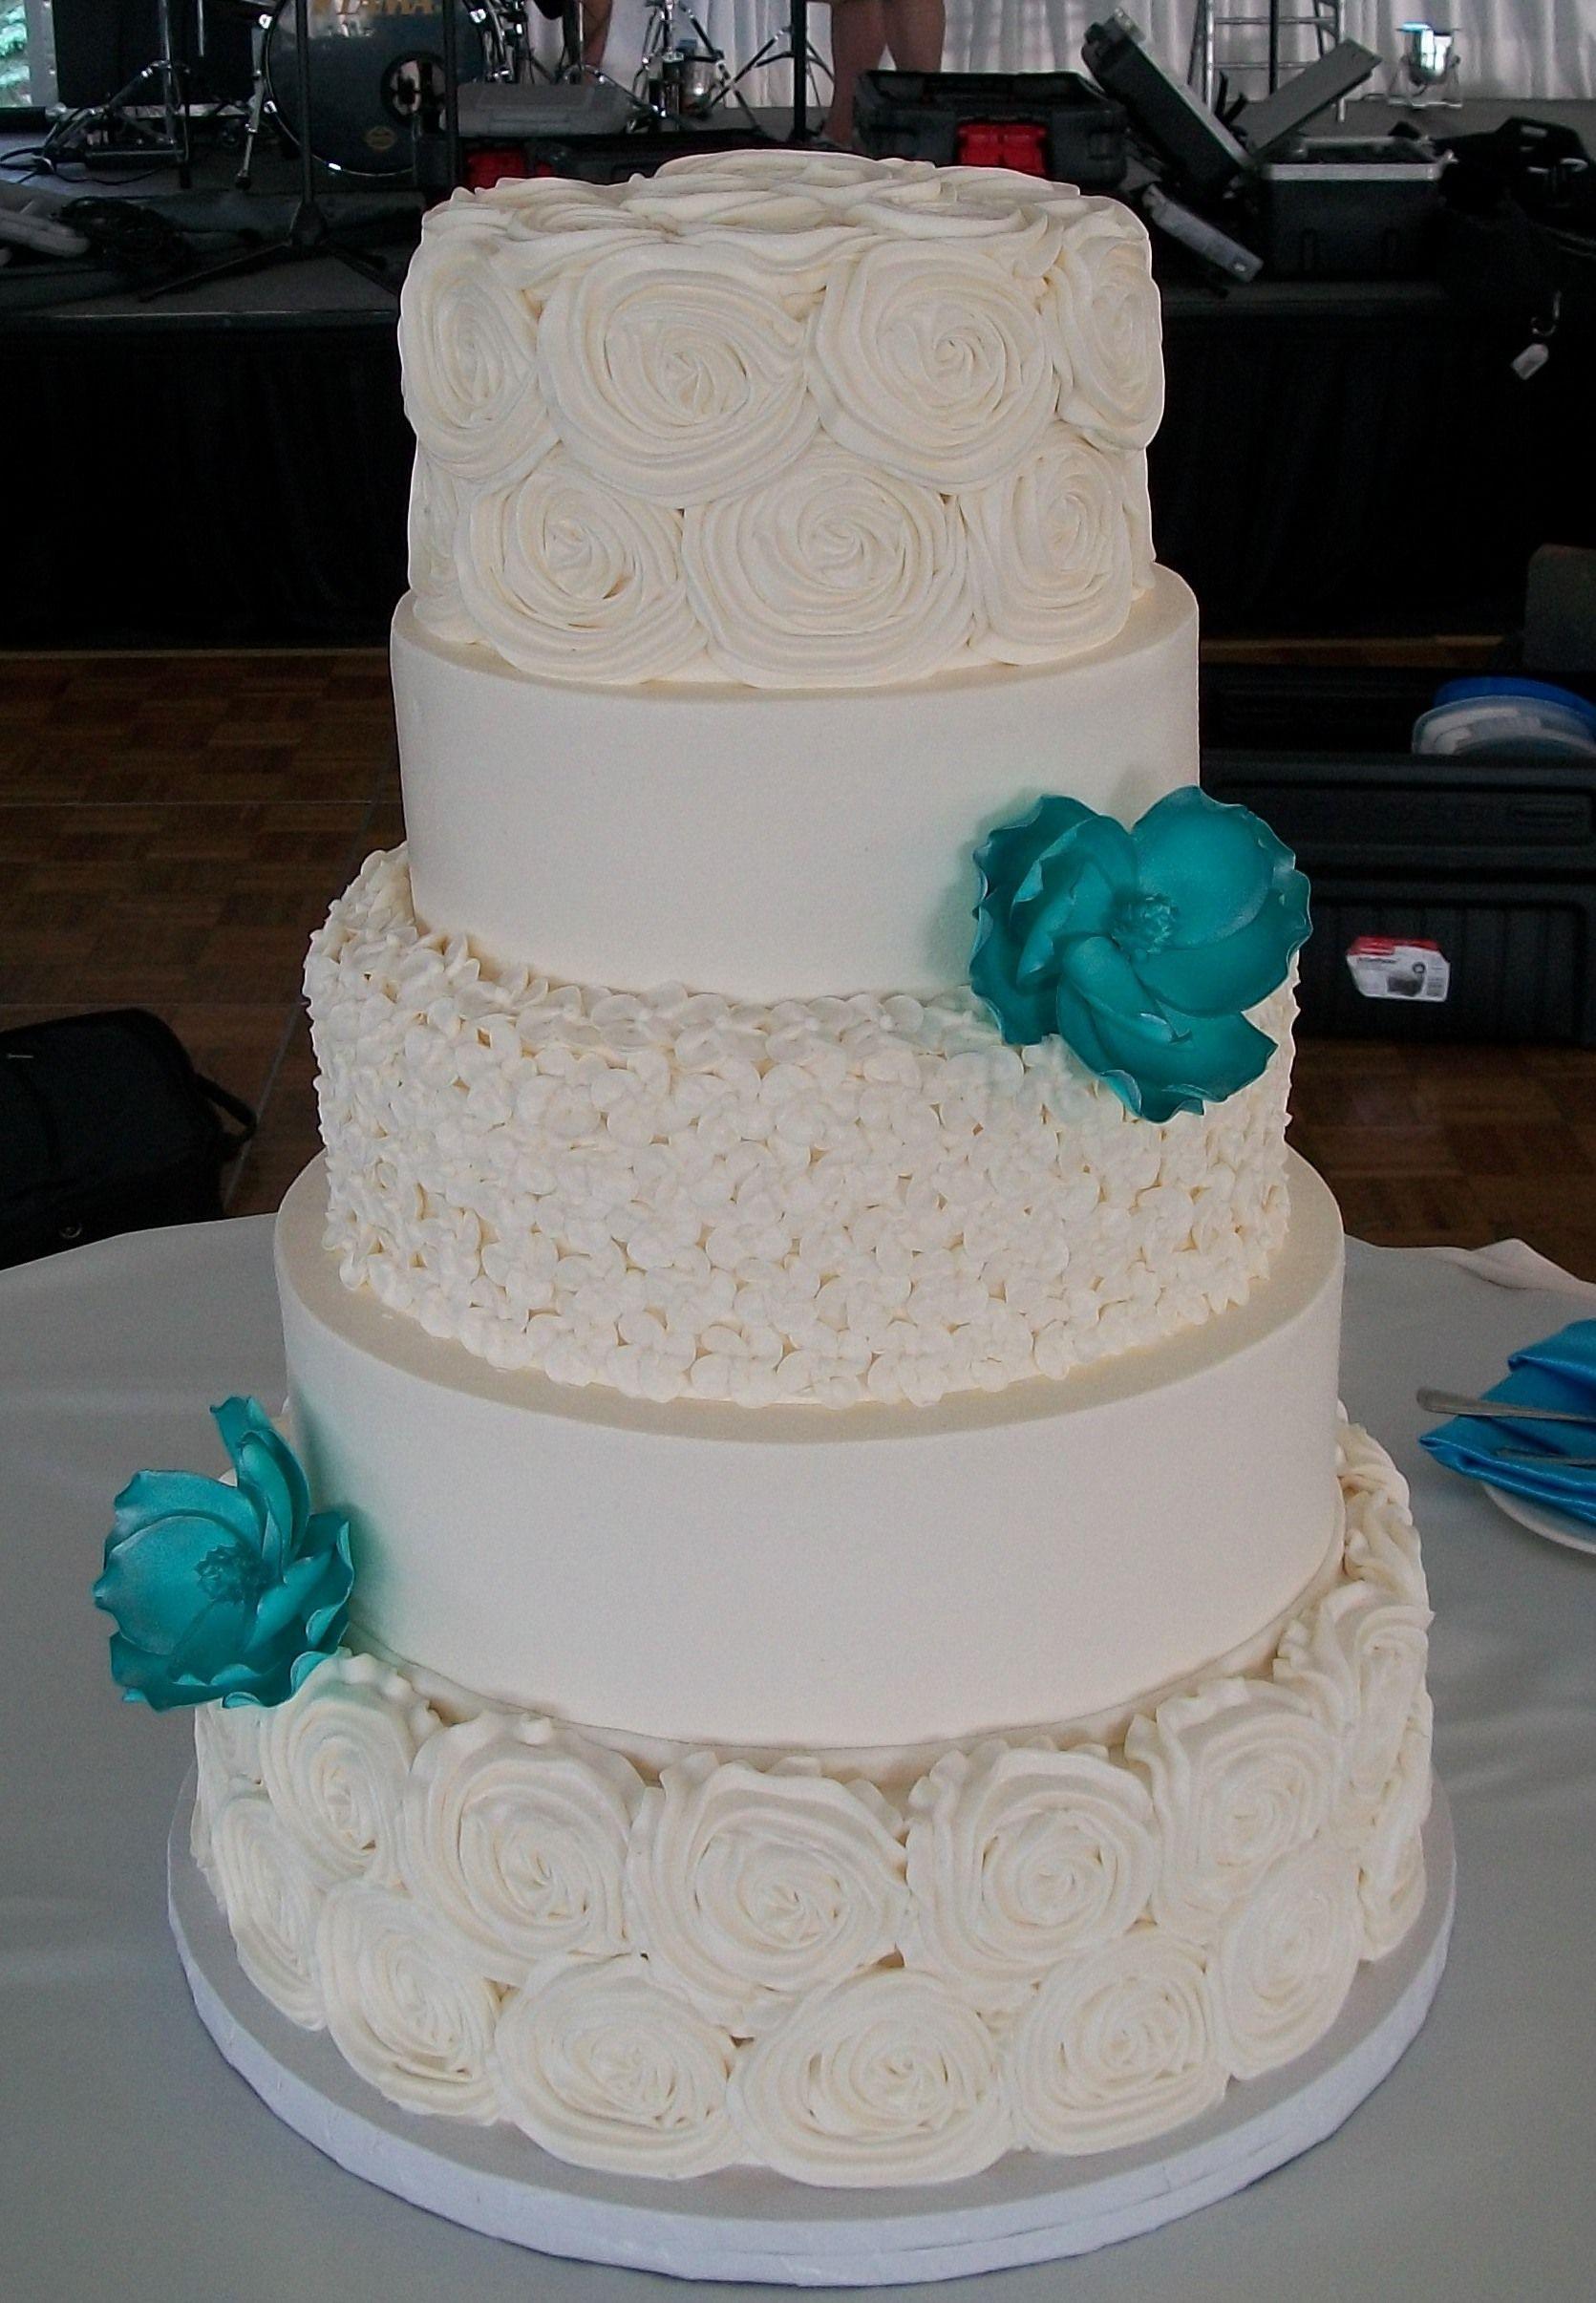 Lovin Oven Wedding Cakes  Christina & Josh s white w turquoise flower wedding cake